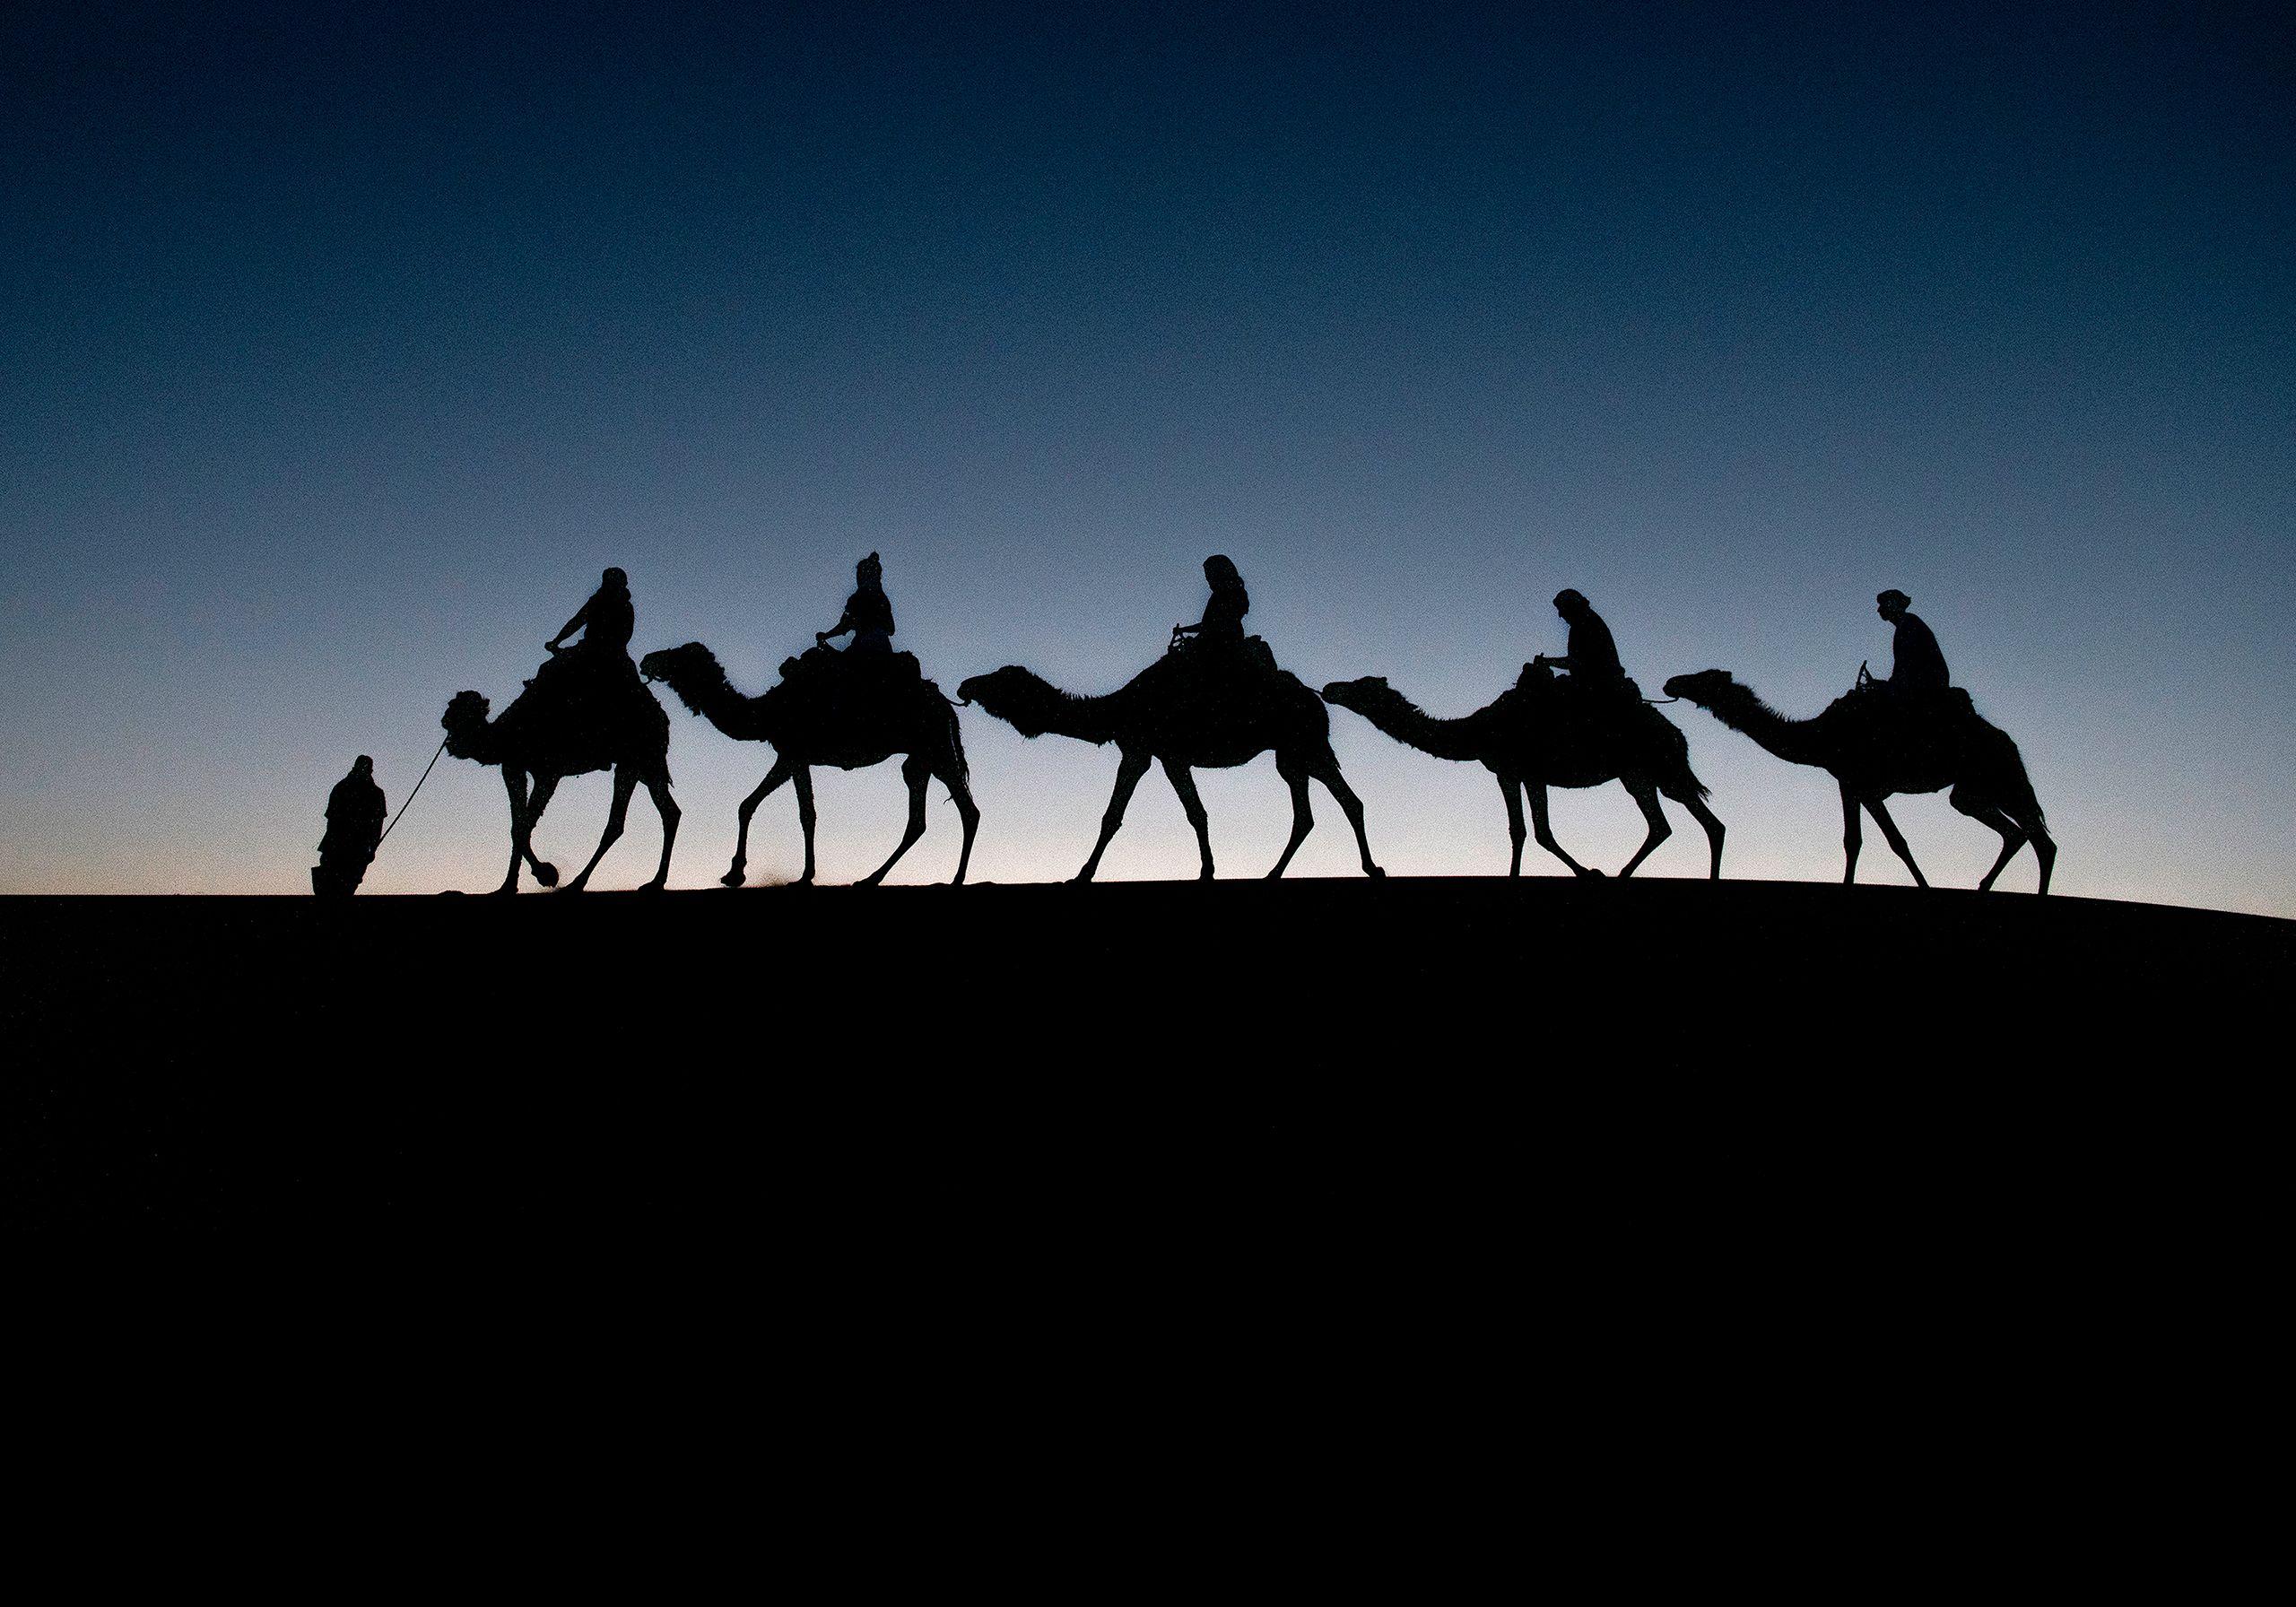 Morocco_Sahara_6523_B_website.jpg